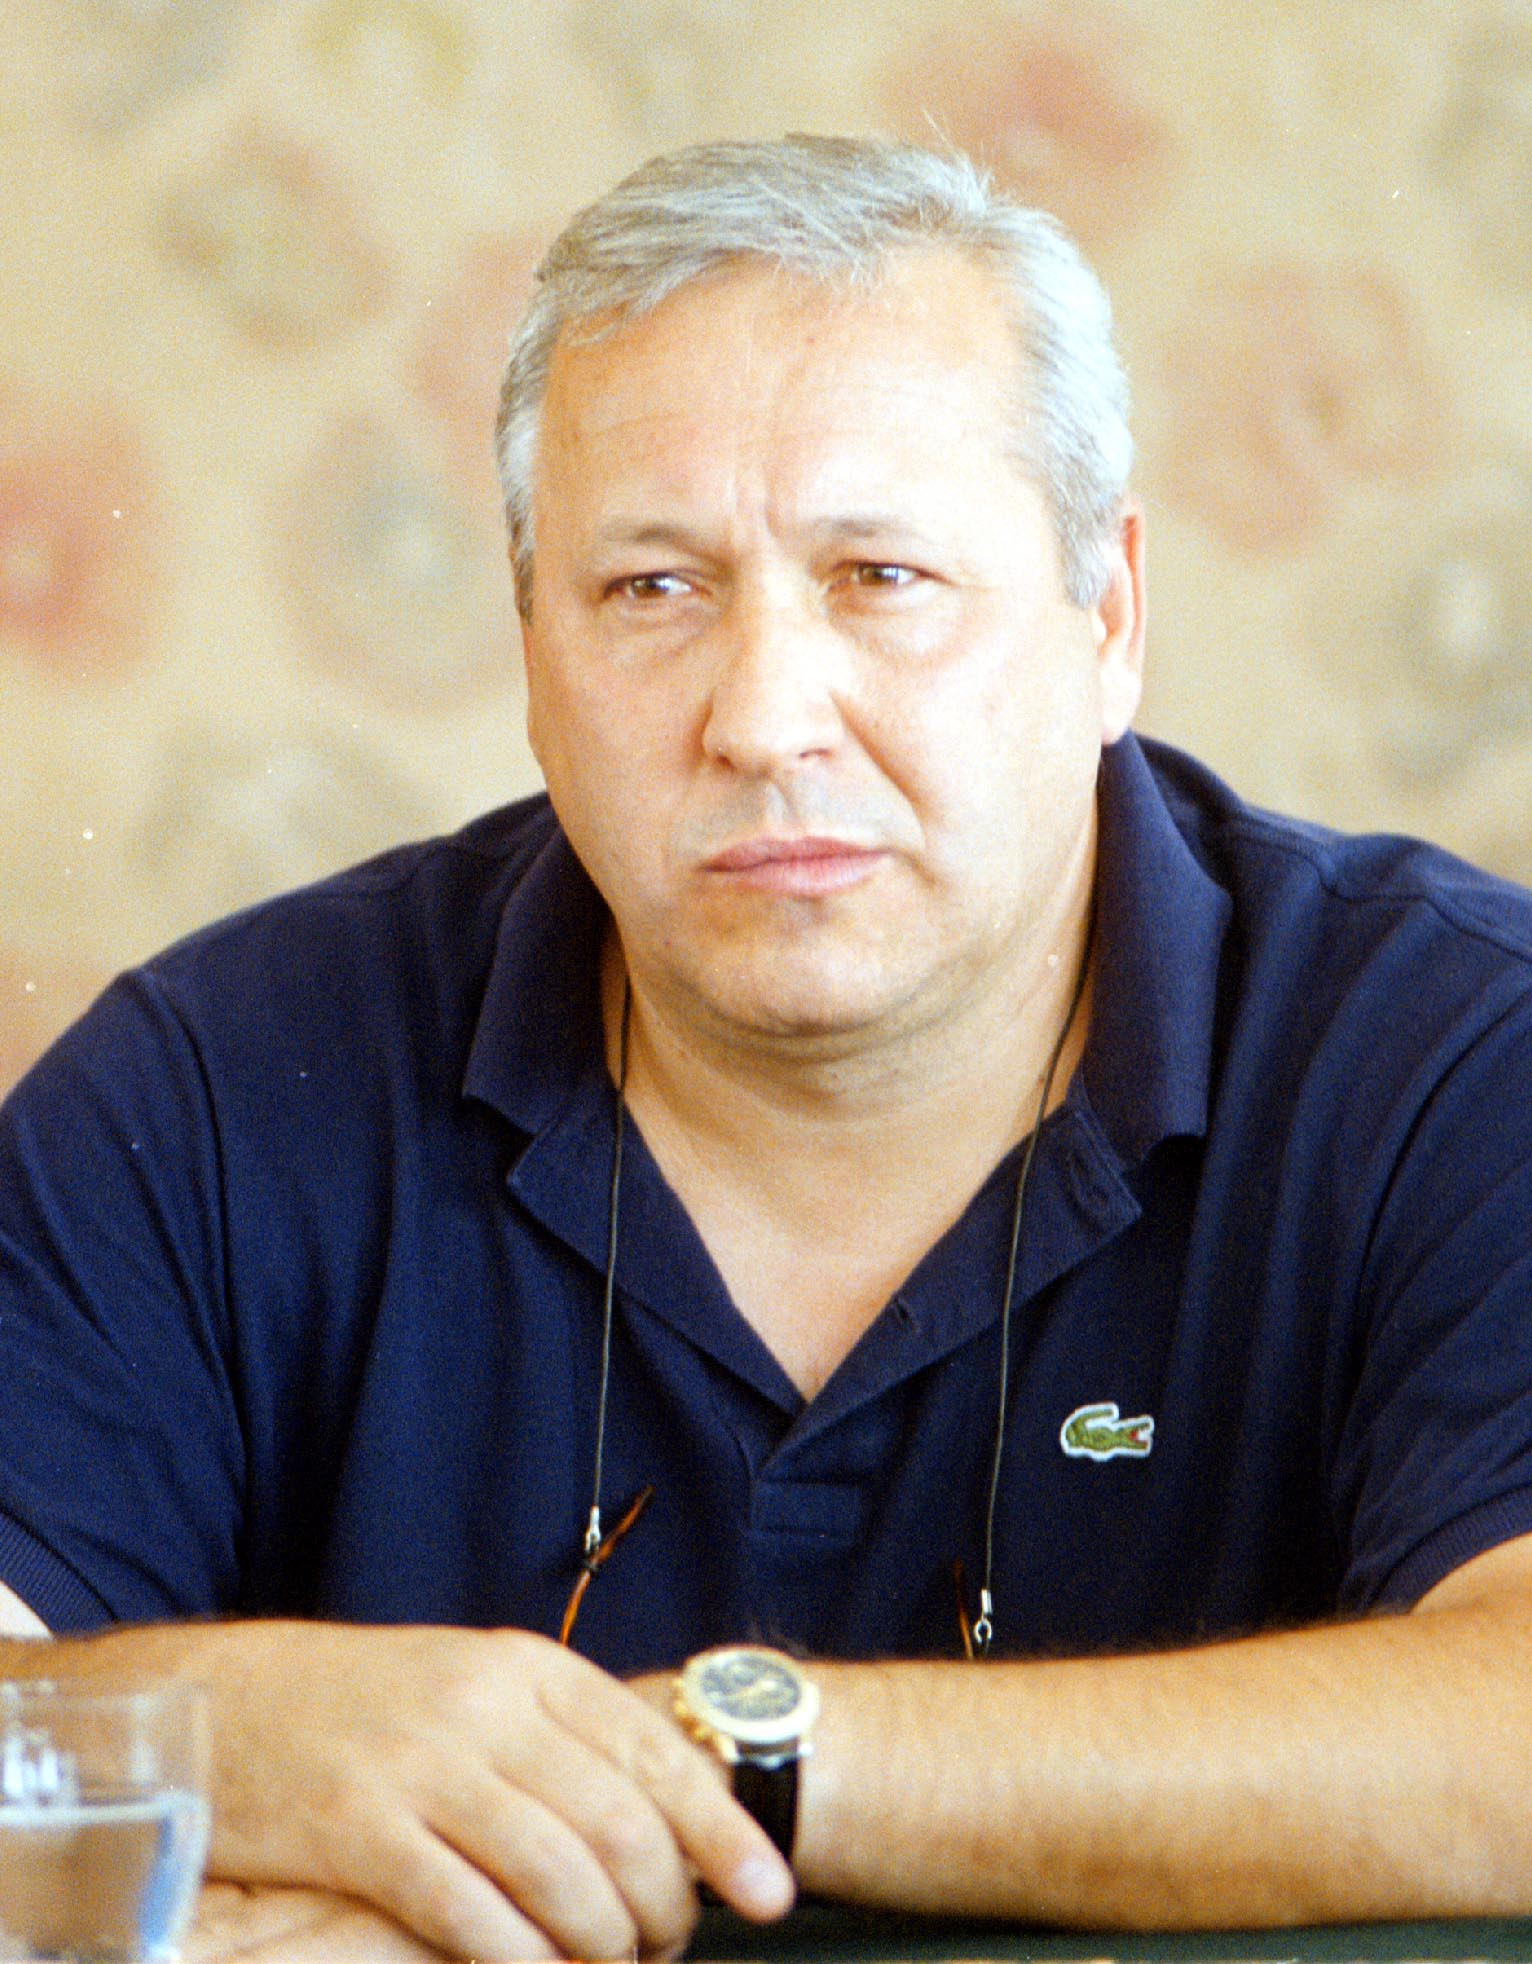 2000. (13.08.) Milorad Krivokapic, selektor juniorske reprezentacije YU